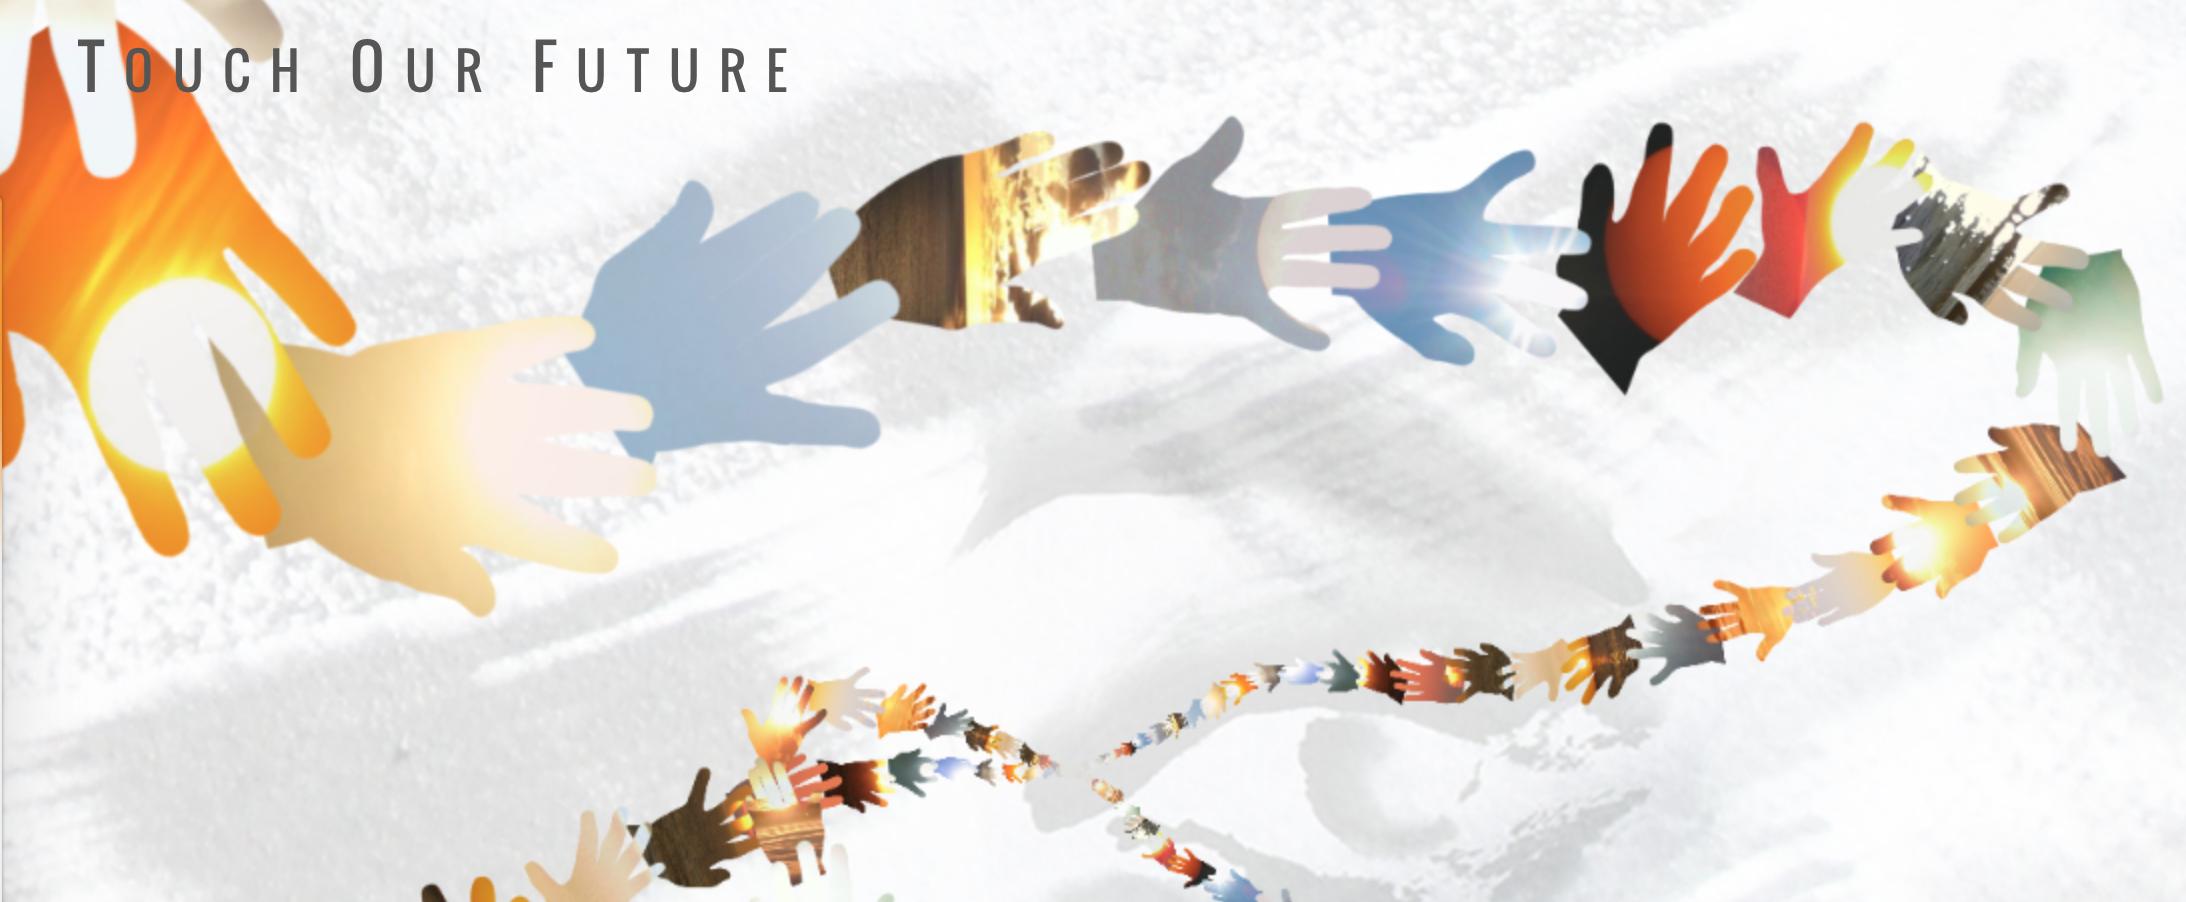 Touch Your Future by Drue Kataoka